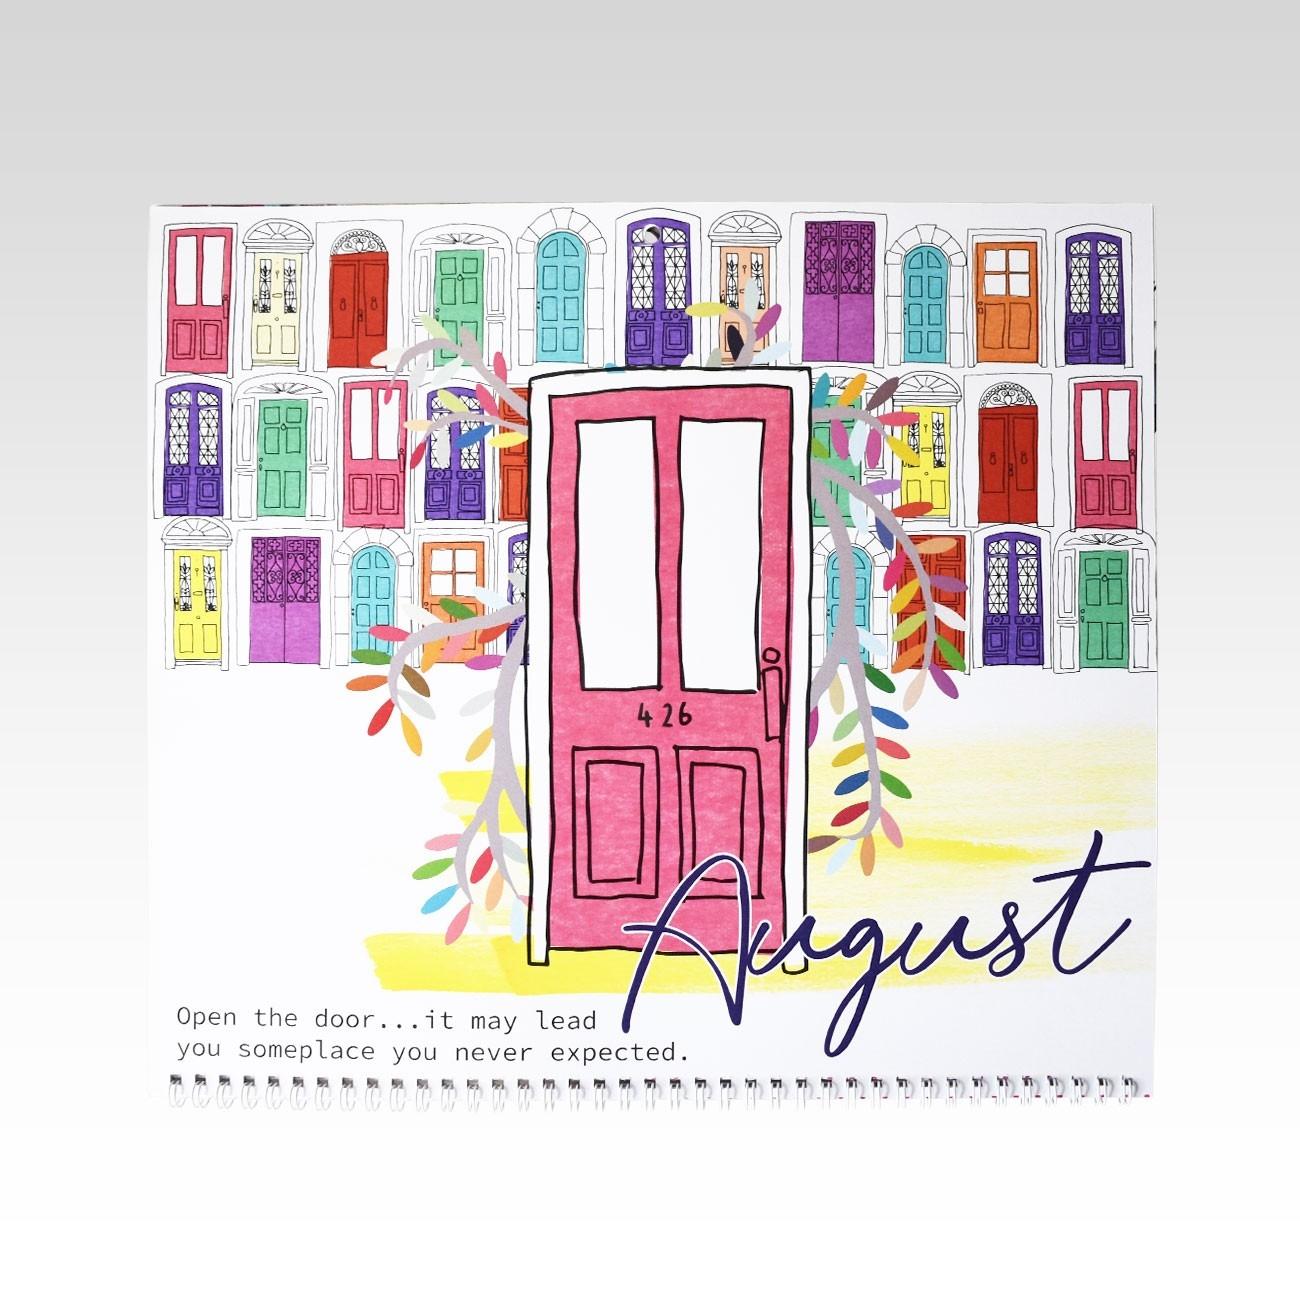 2020 Calendar  2020 Calendar With Open Squares